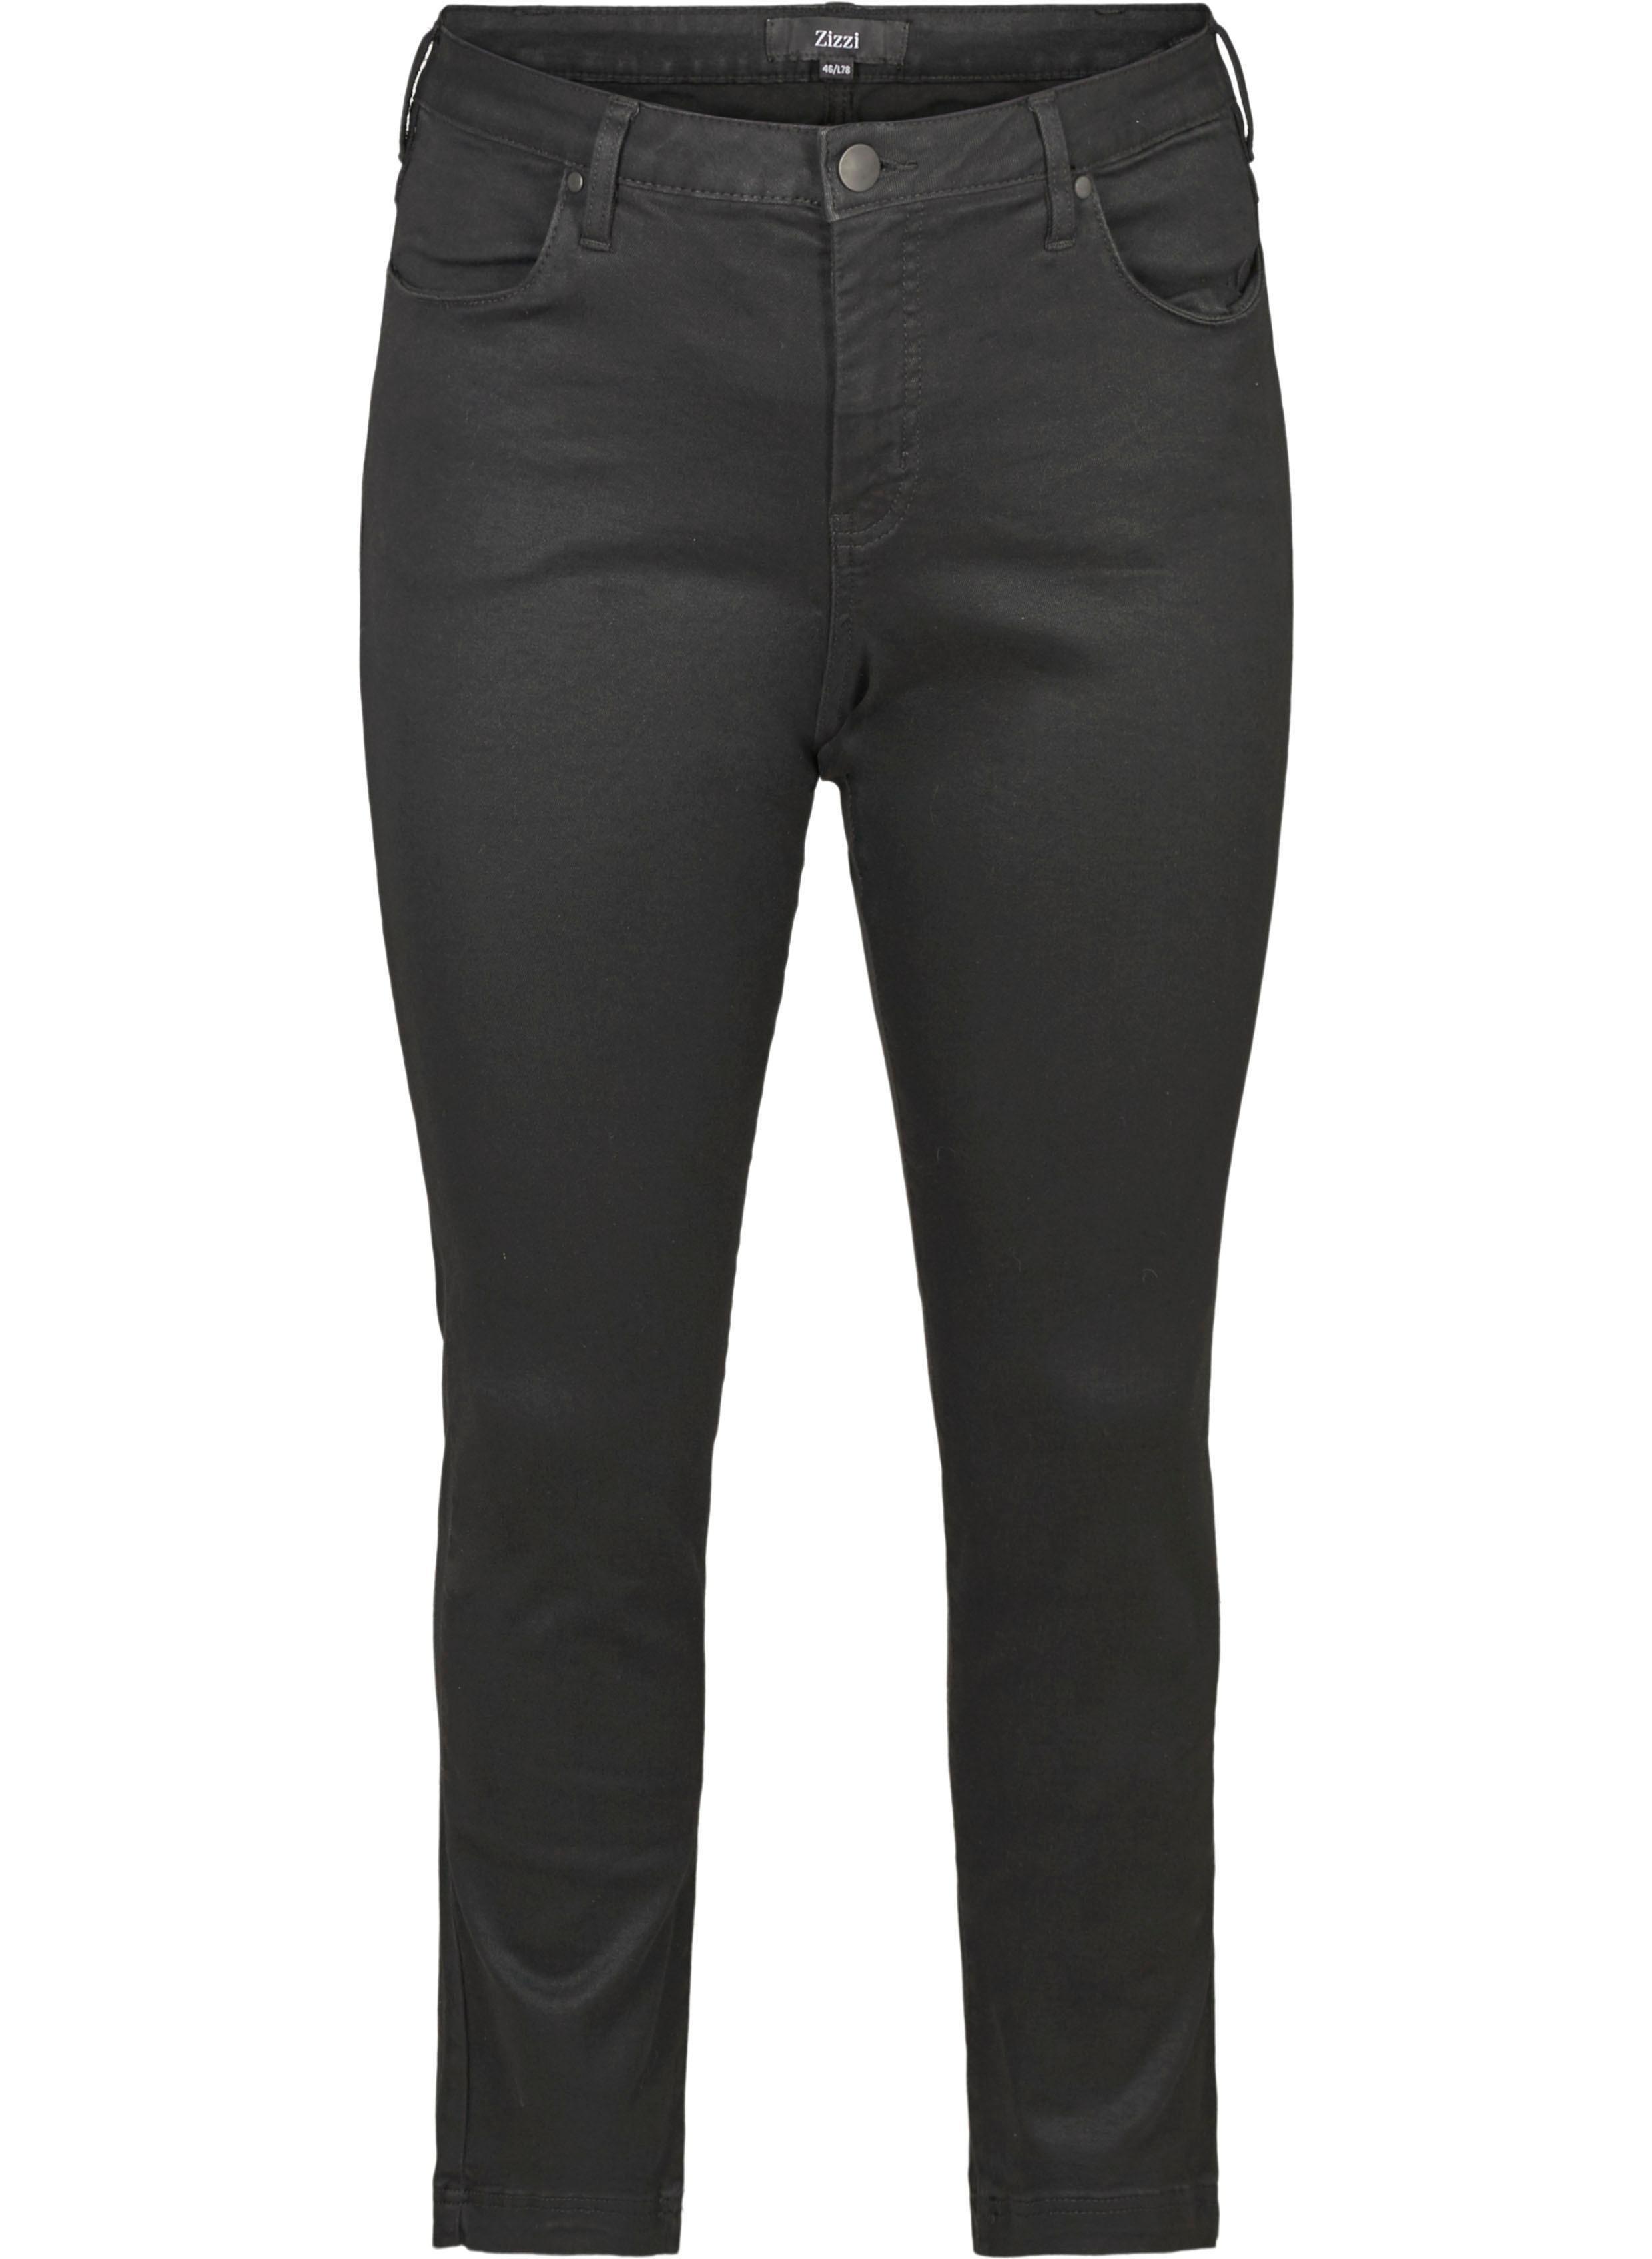 Zizzi slim fit jeans »Emily« - verschillende betaalmethodes